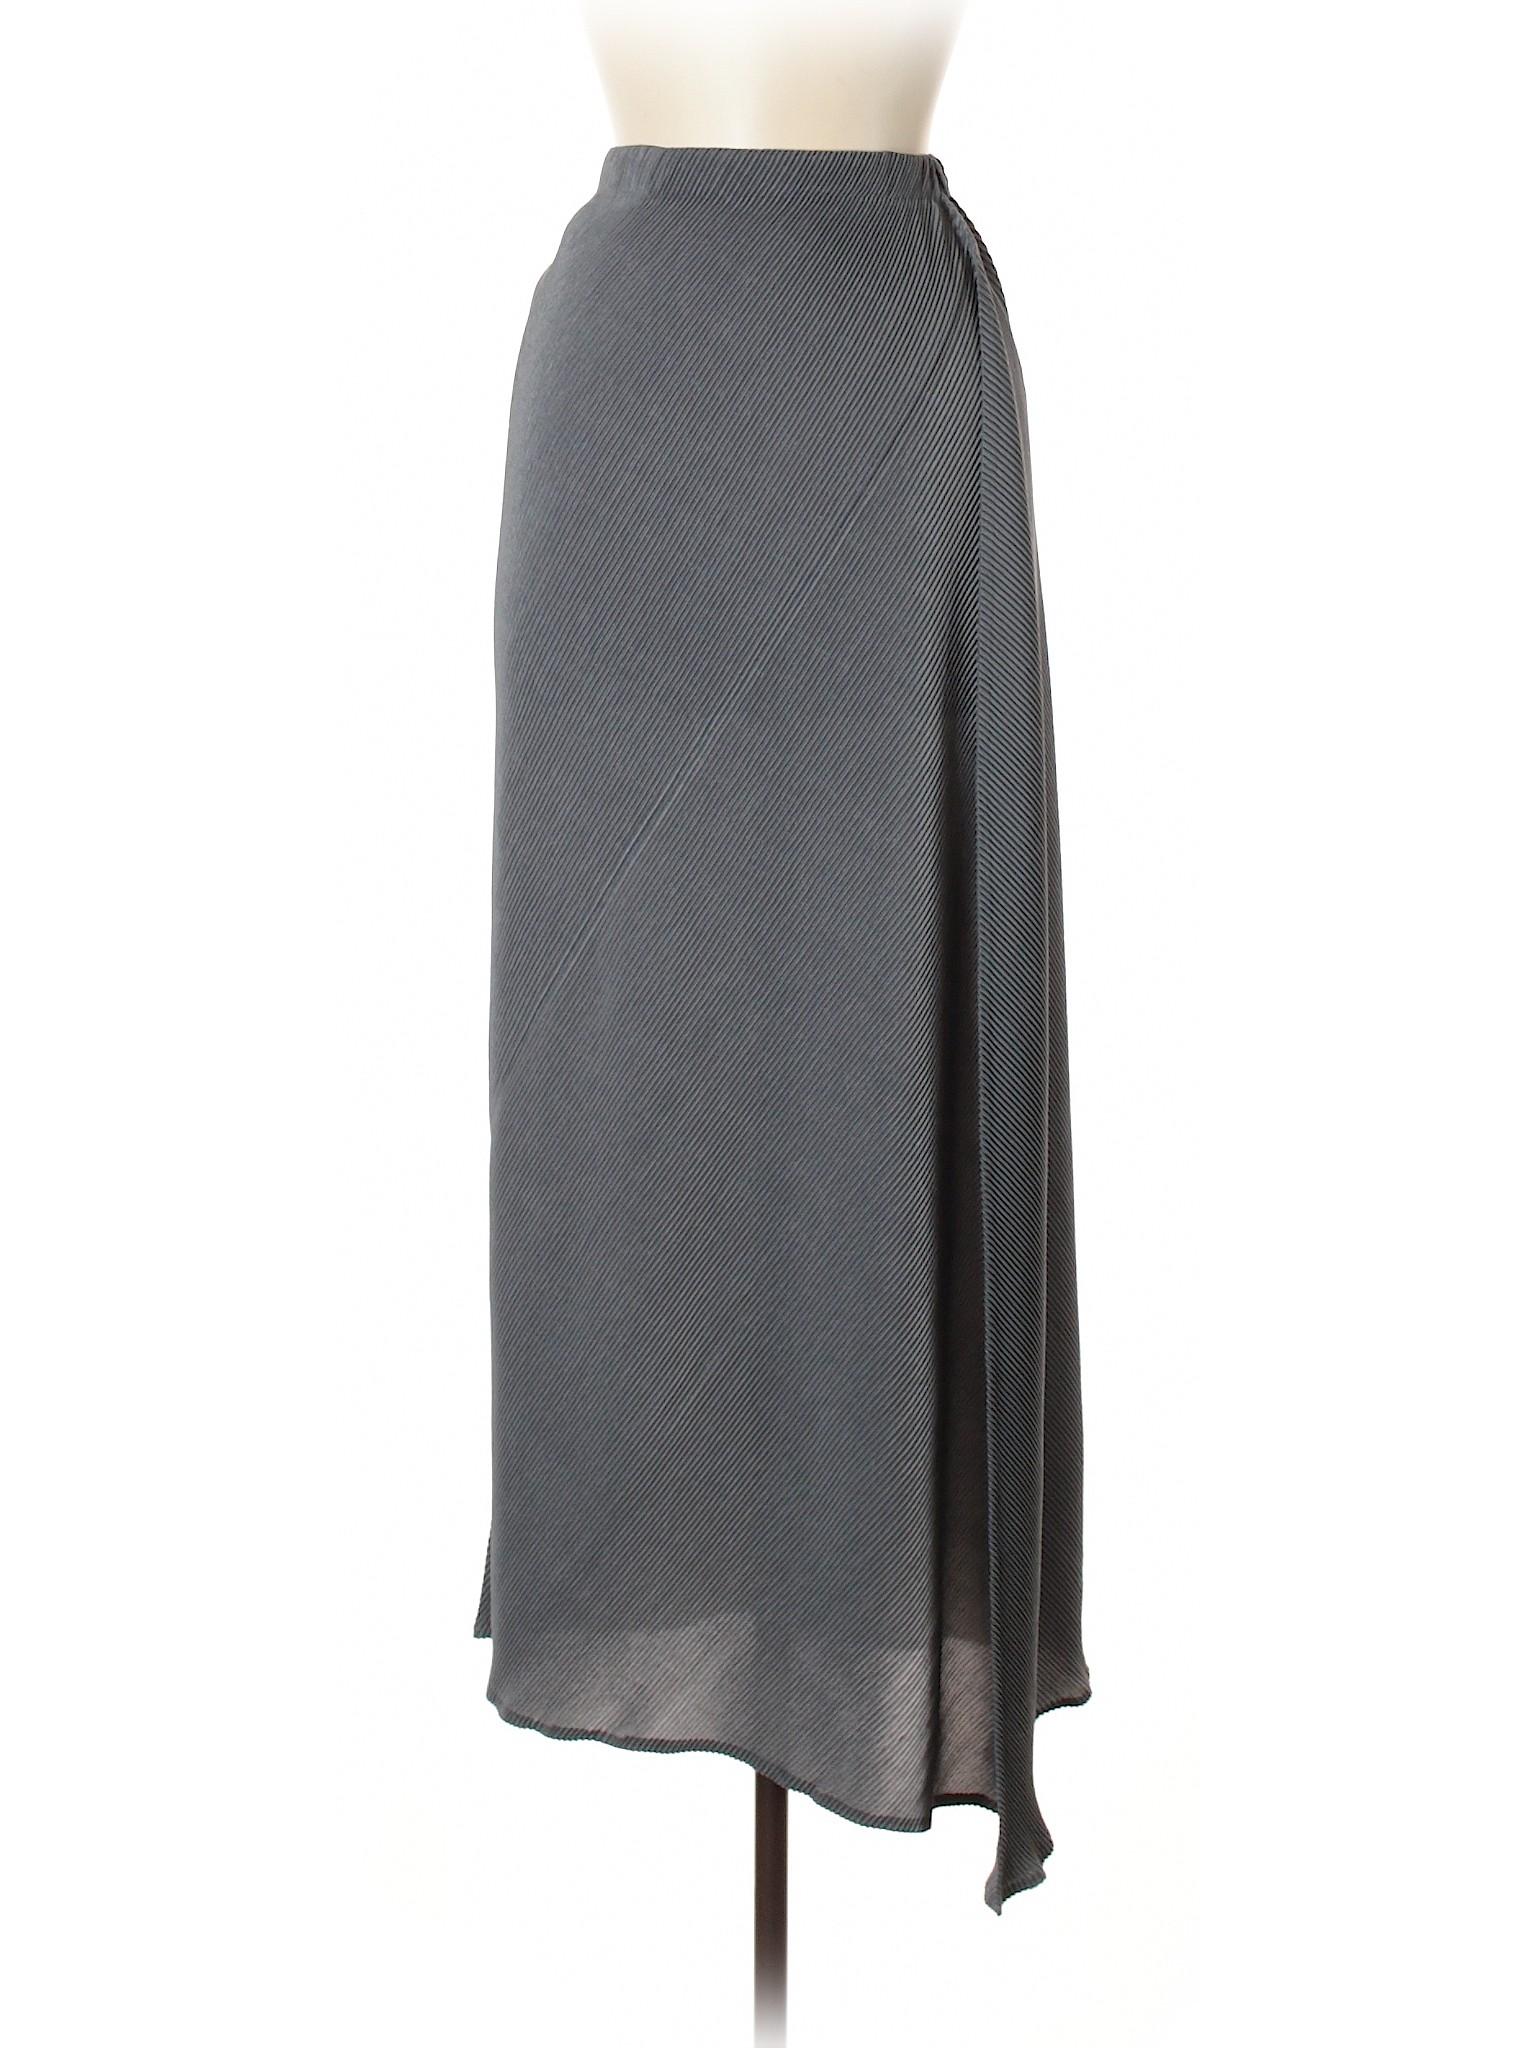 Skirt Boutique Boutique Casual Casual Skirt Boutique Boutique Skirt Casual nHXFvxqP